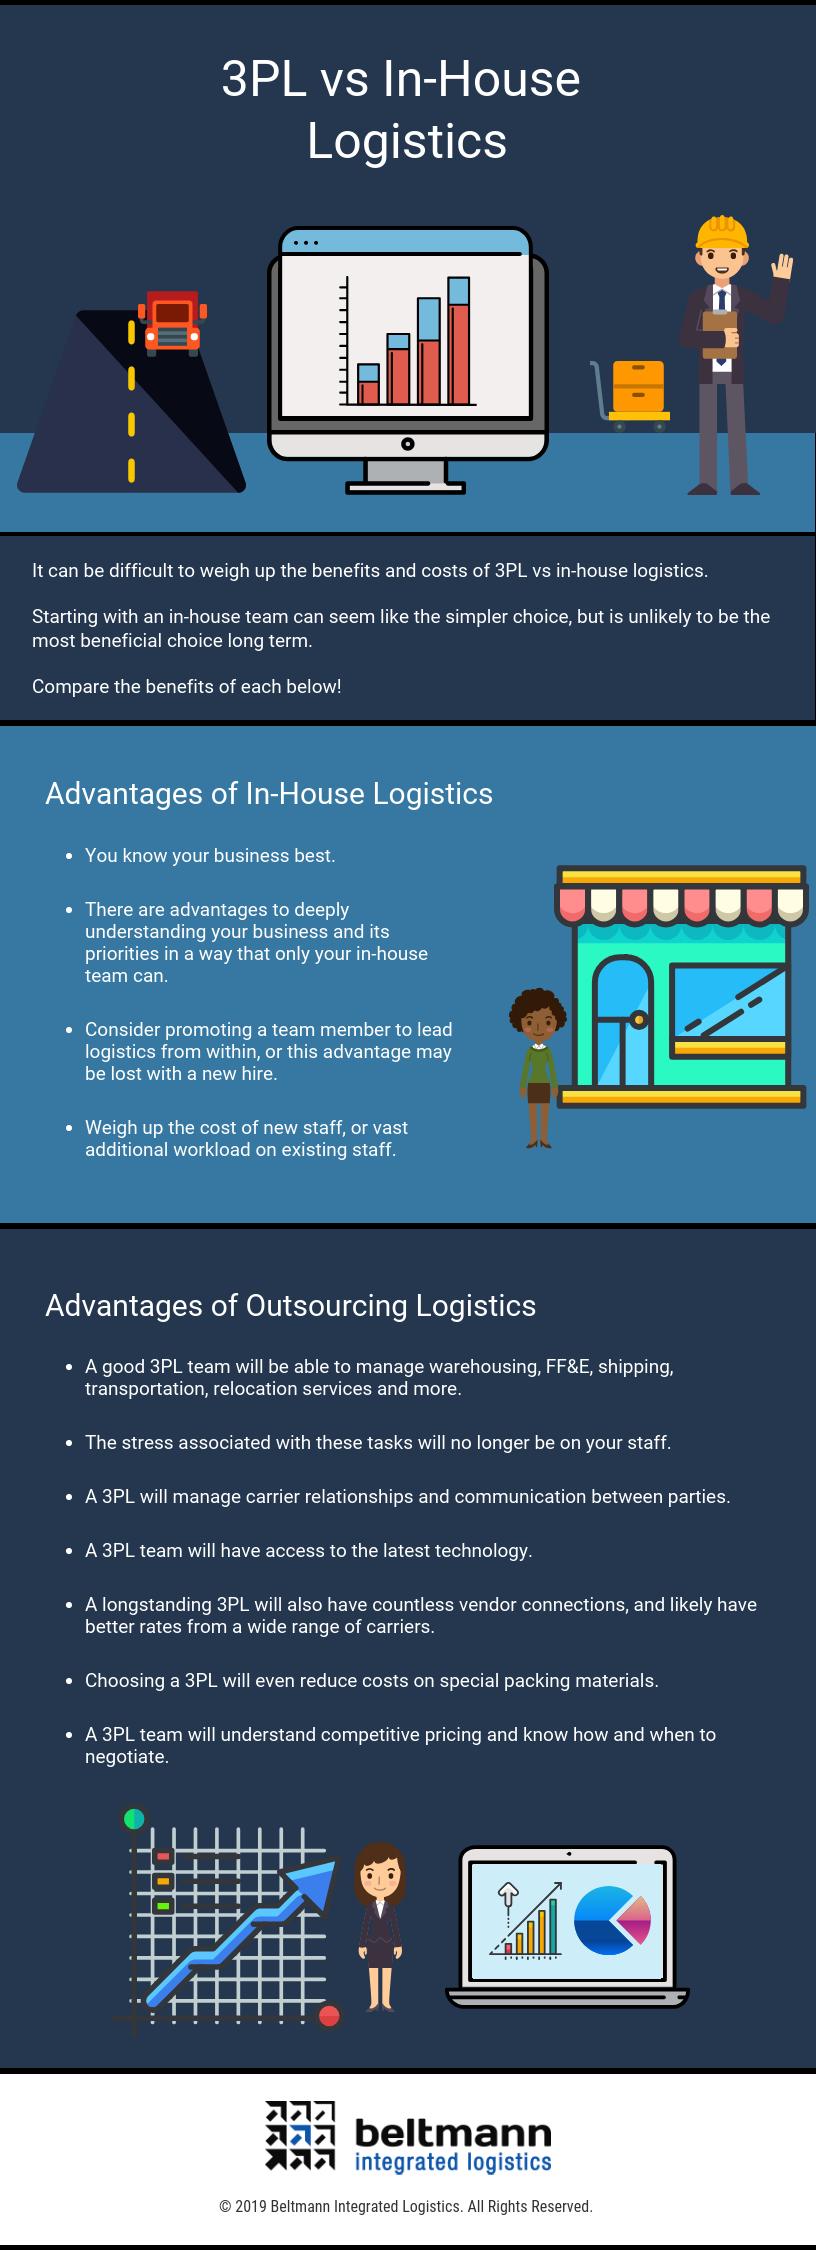 3PL vs In-House Logistics